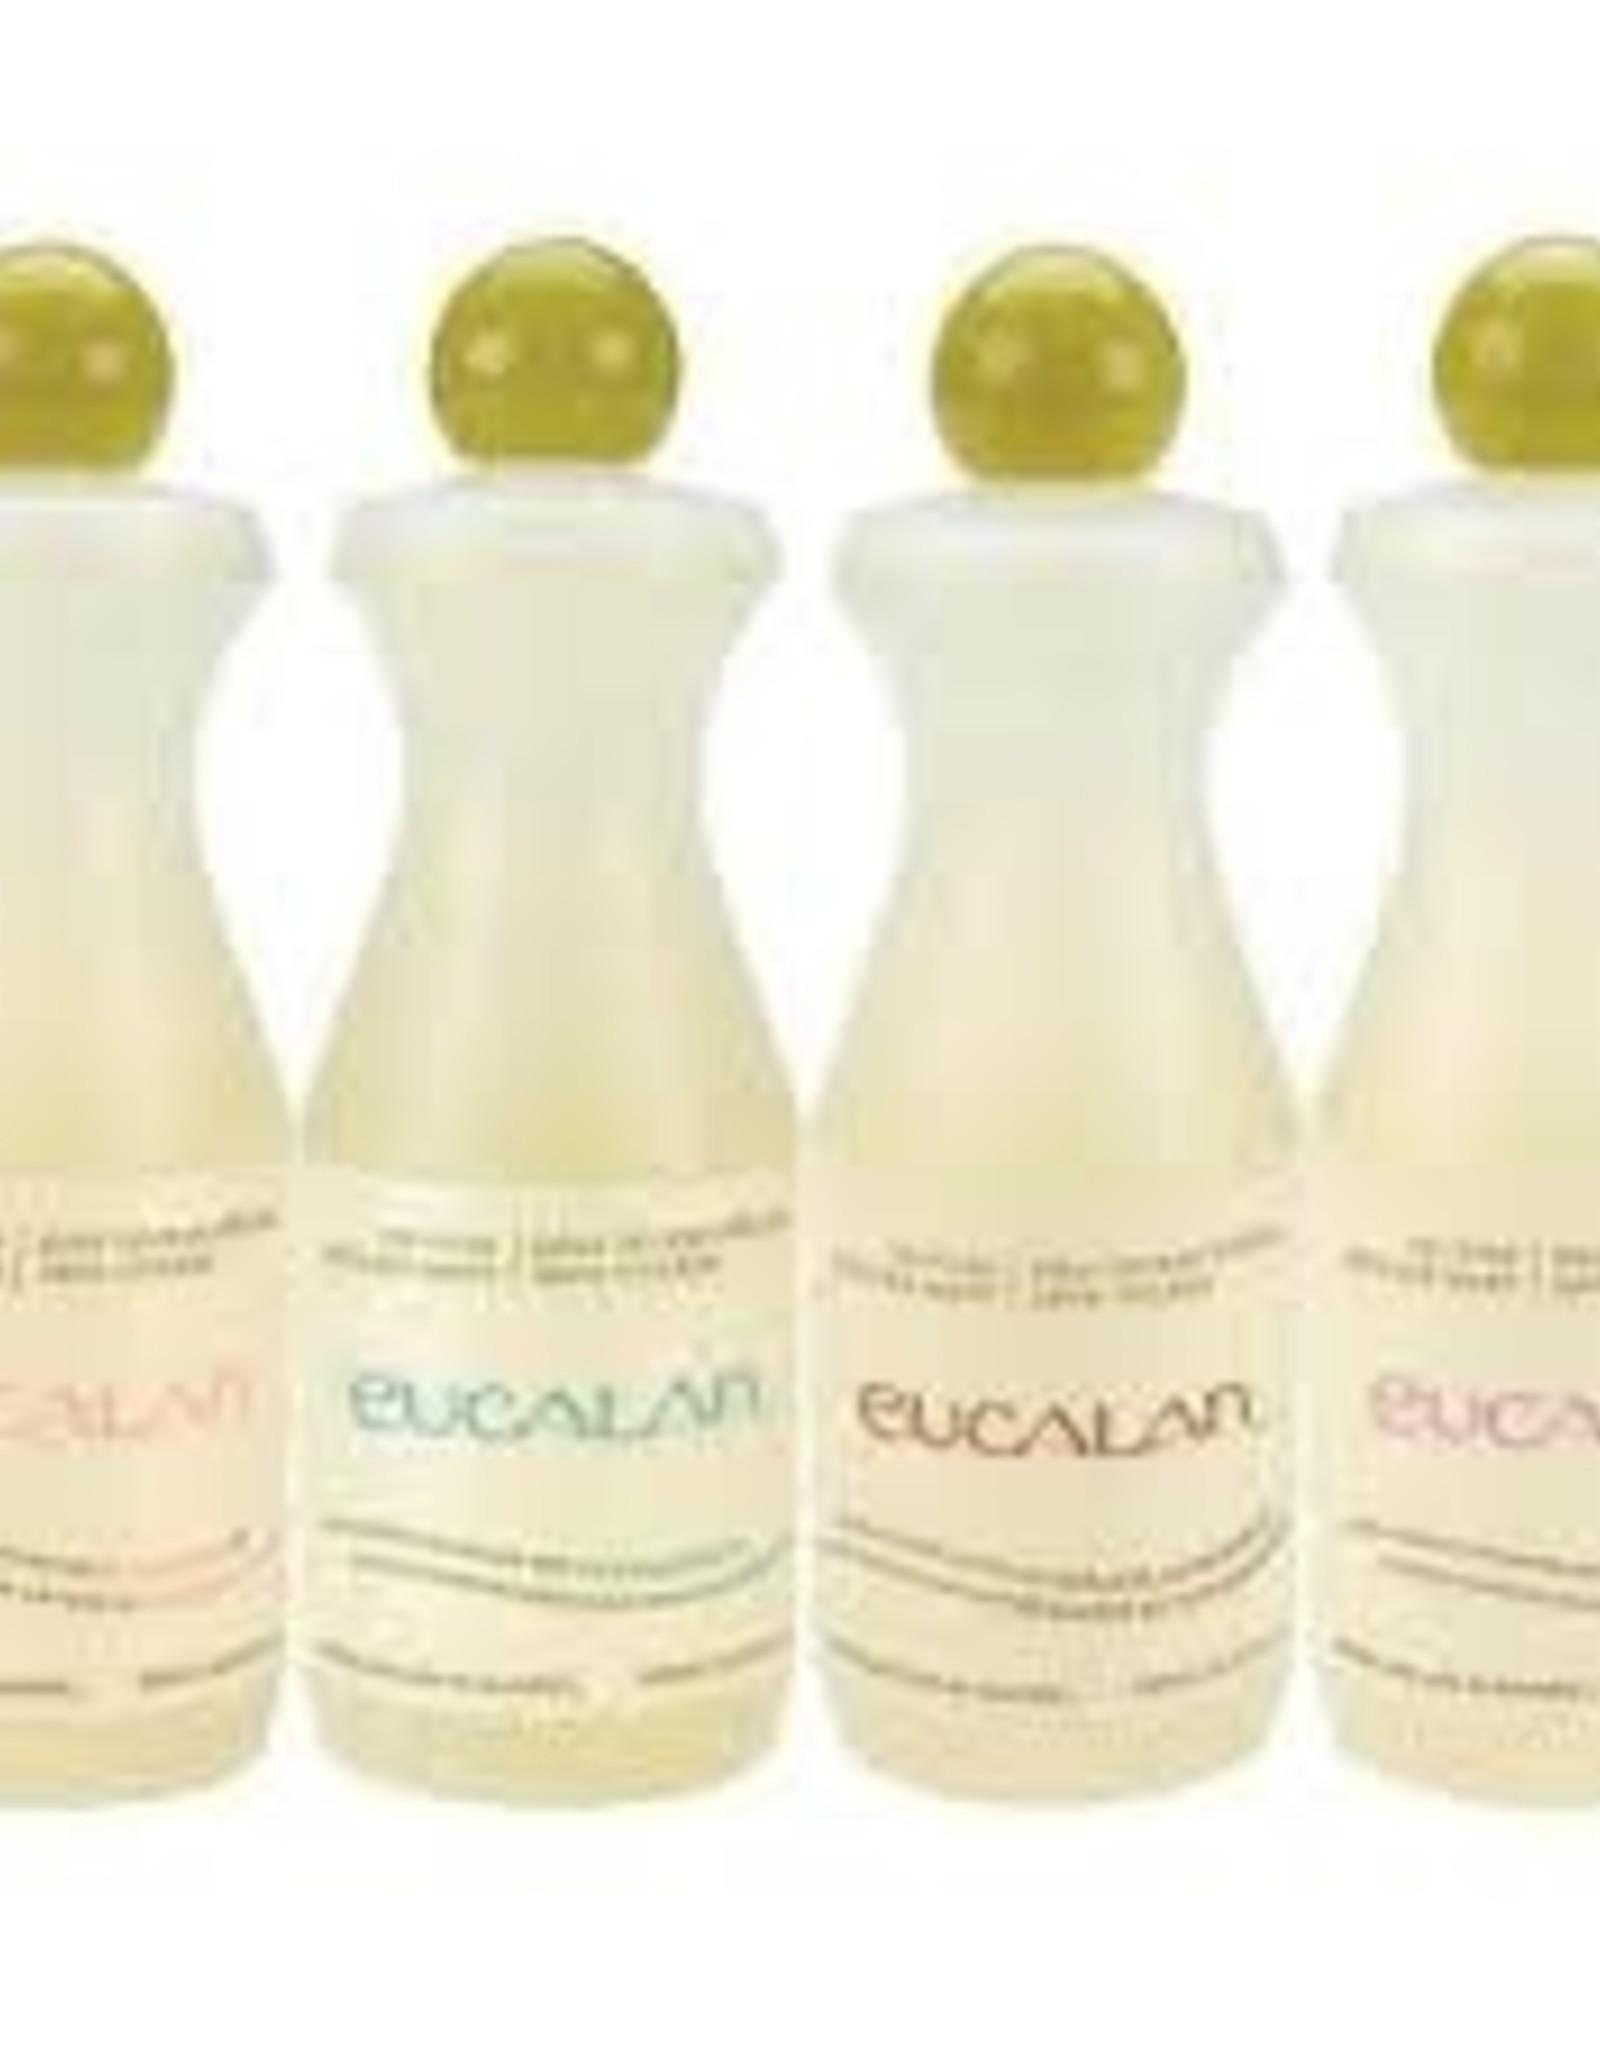 Eucalan 500 ml Lavender